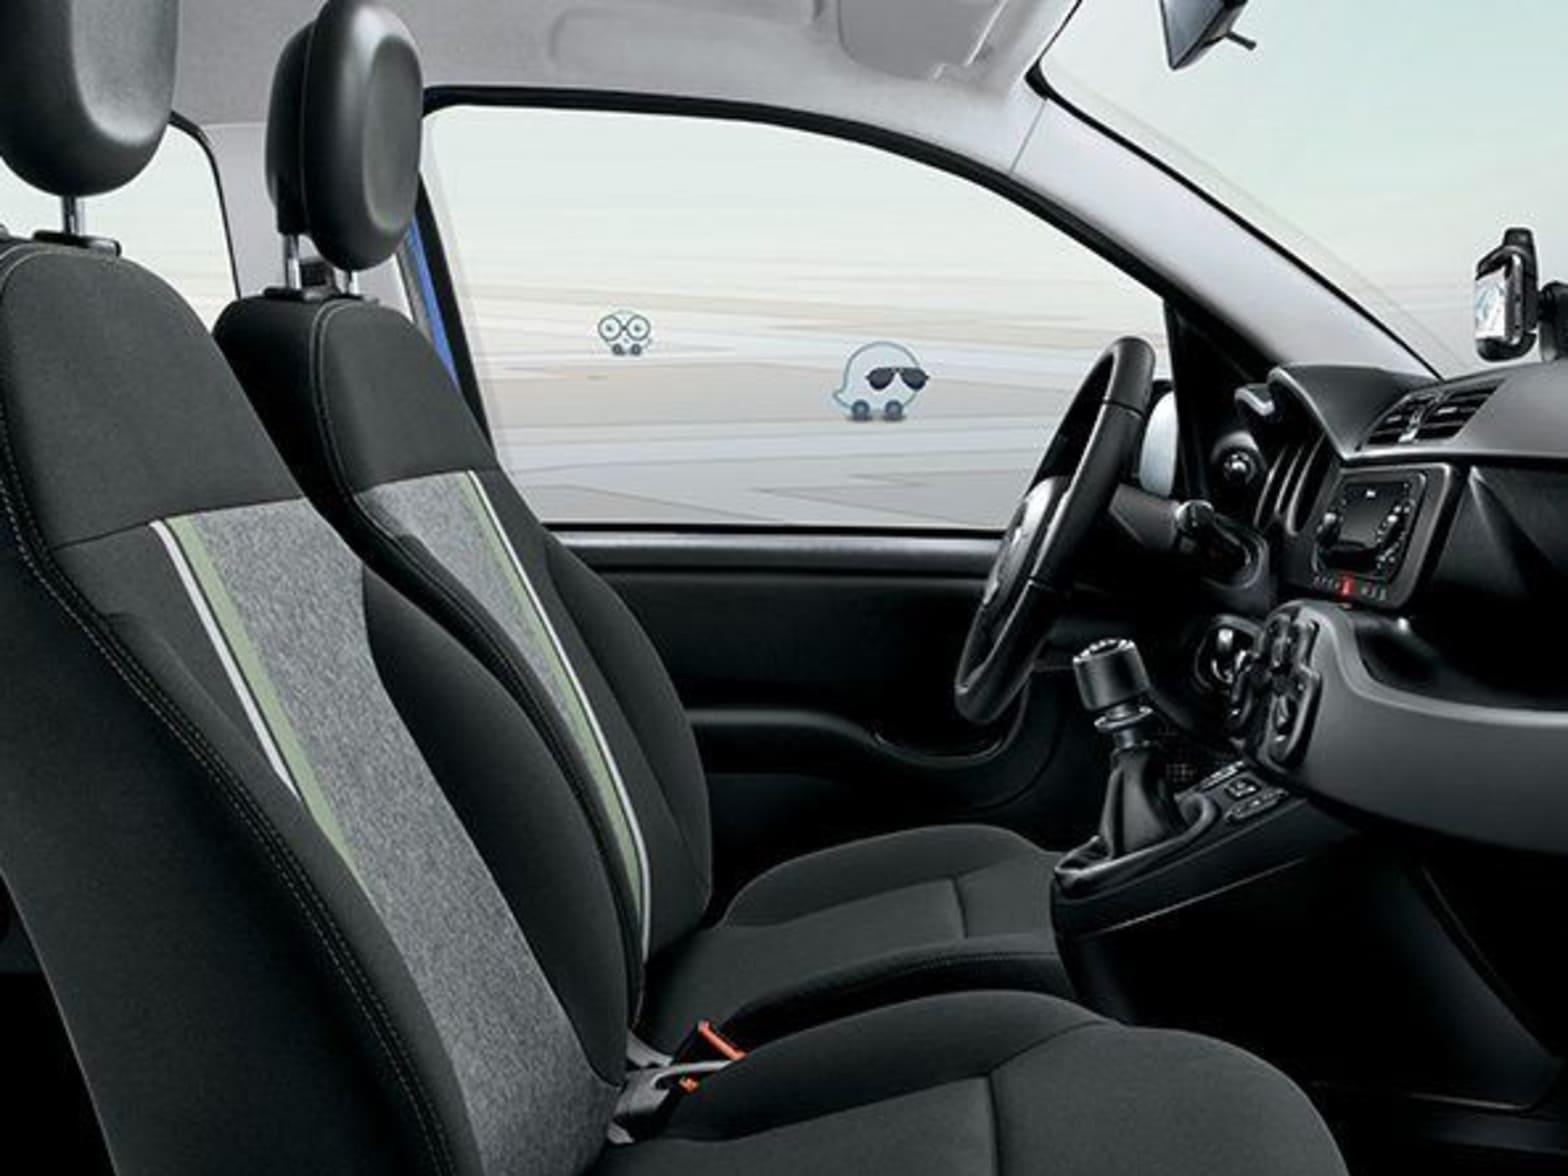 Fiat Panda Waze 4X4 | Westover Fiat